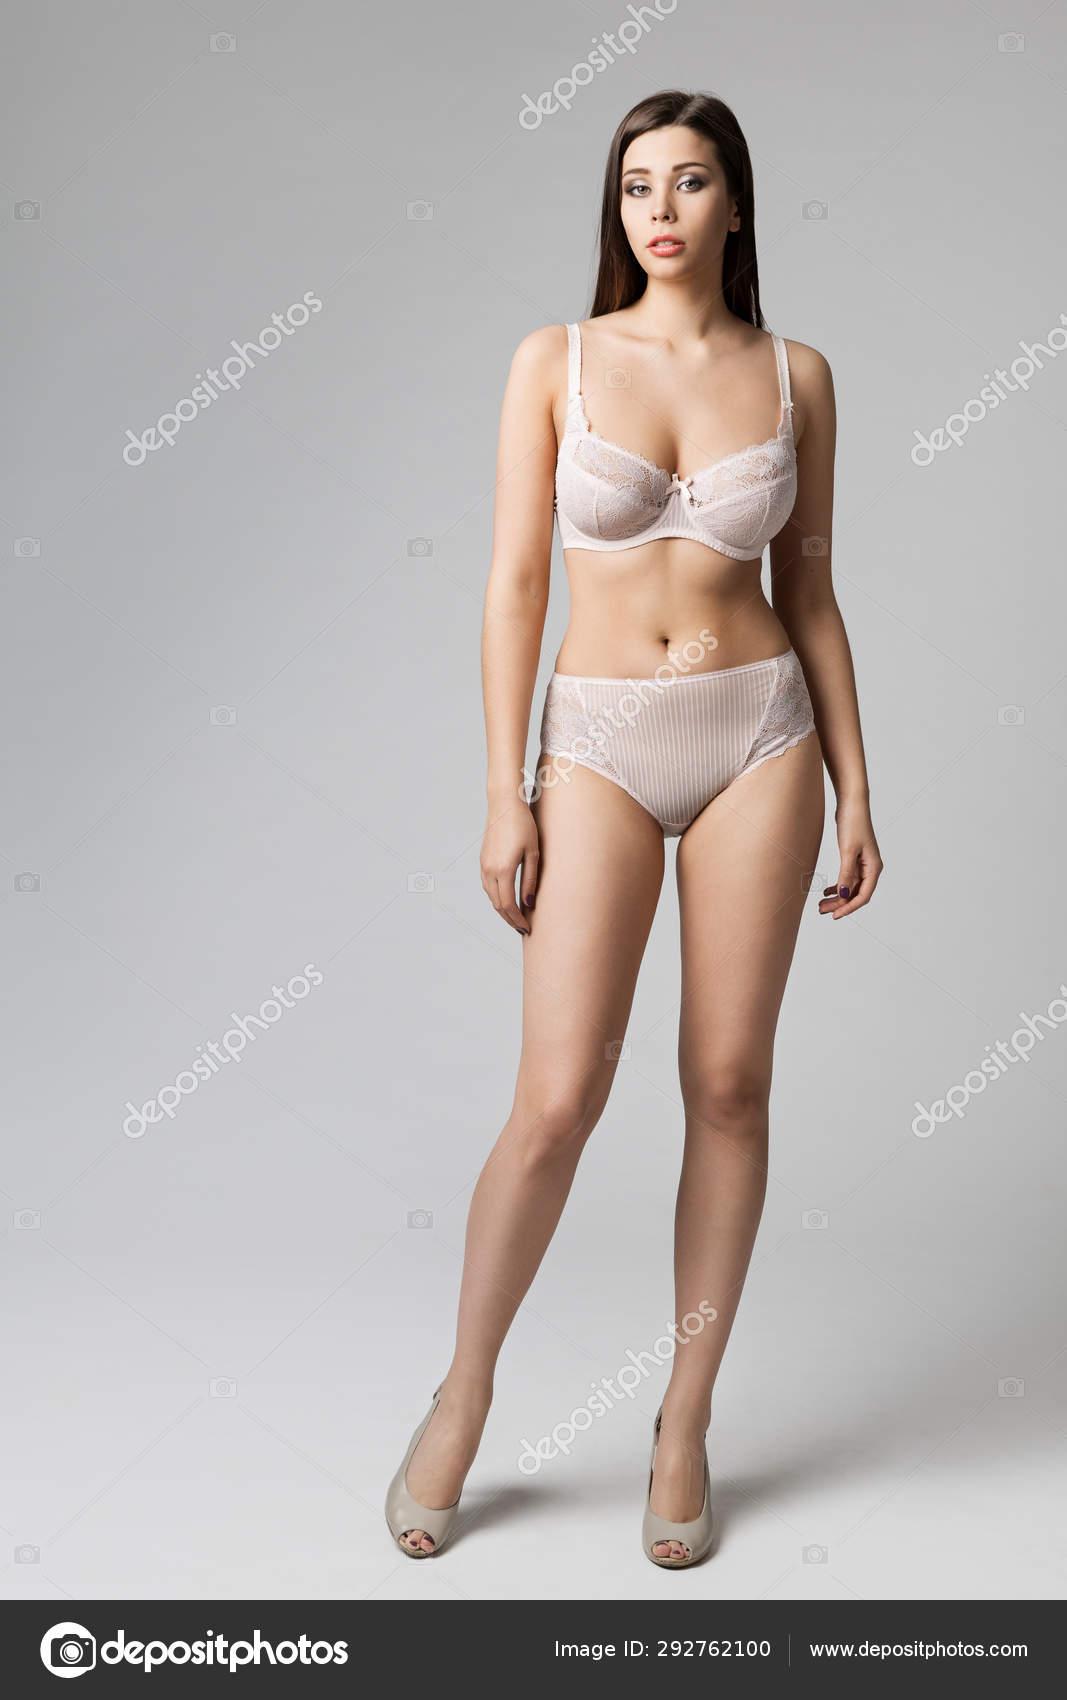 Fashion Model Sexy Underwear Woman Bra Panties Full Length Portrait On White Stock Photo Image By C Inarik 292762100